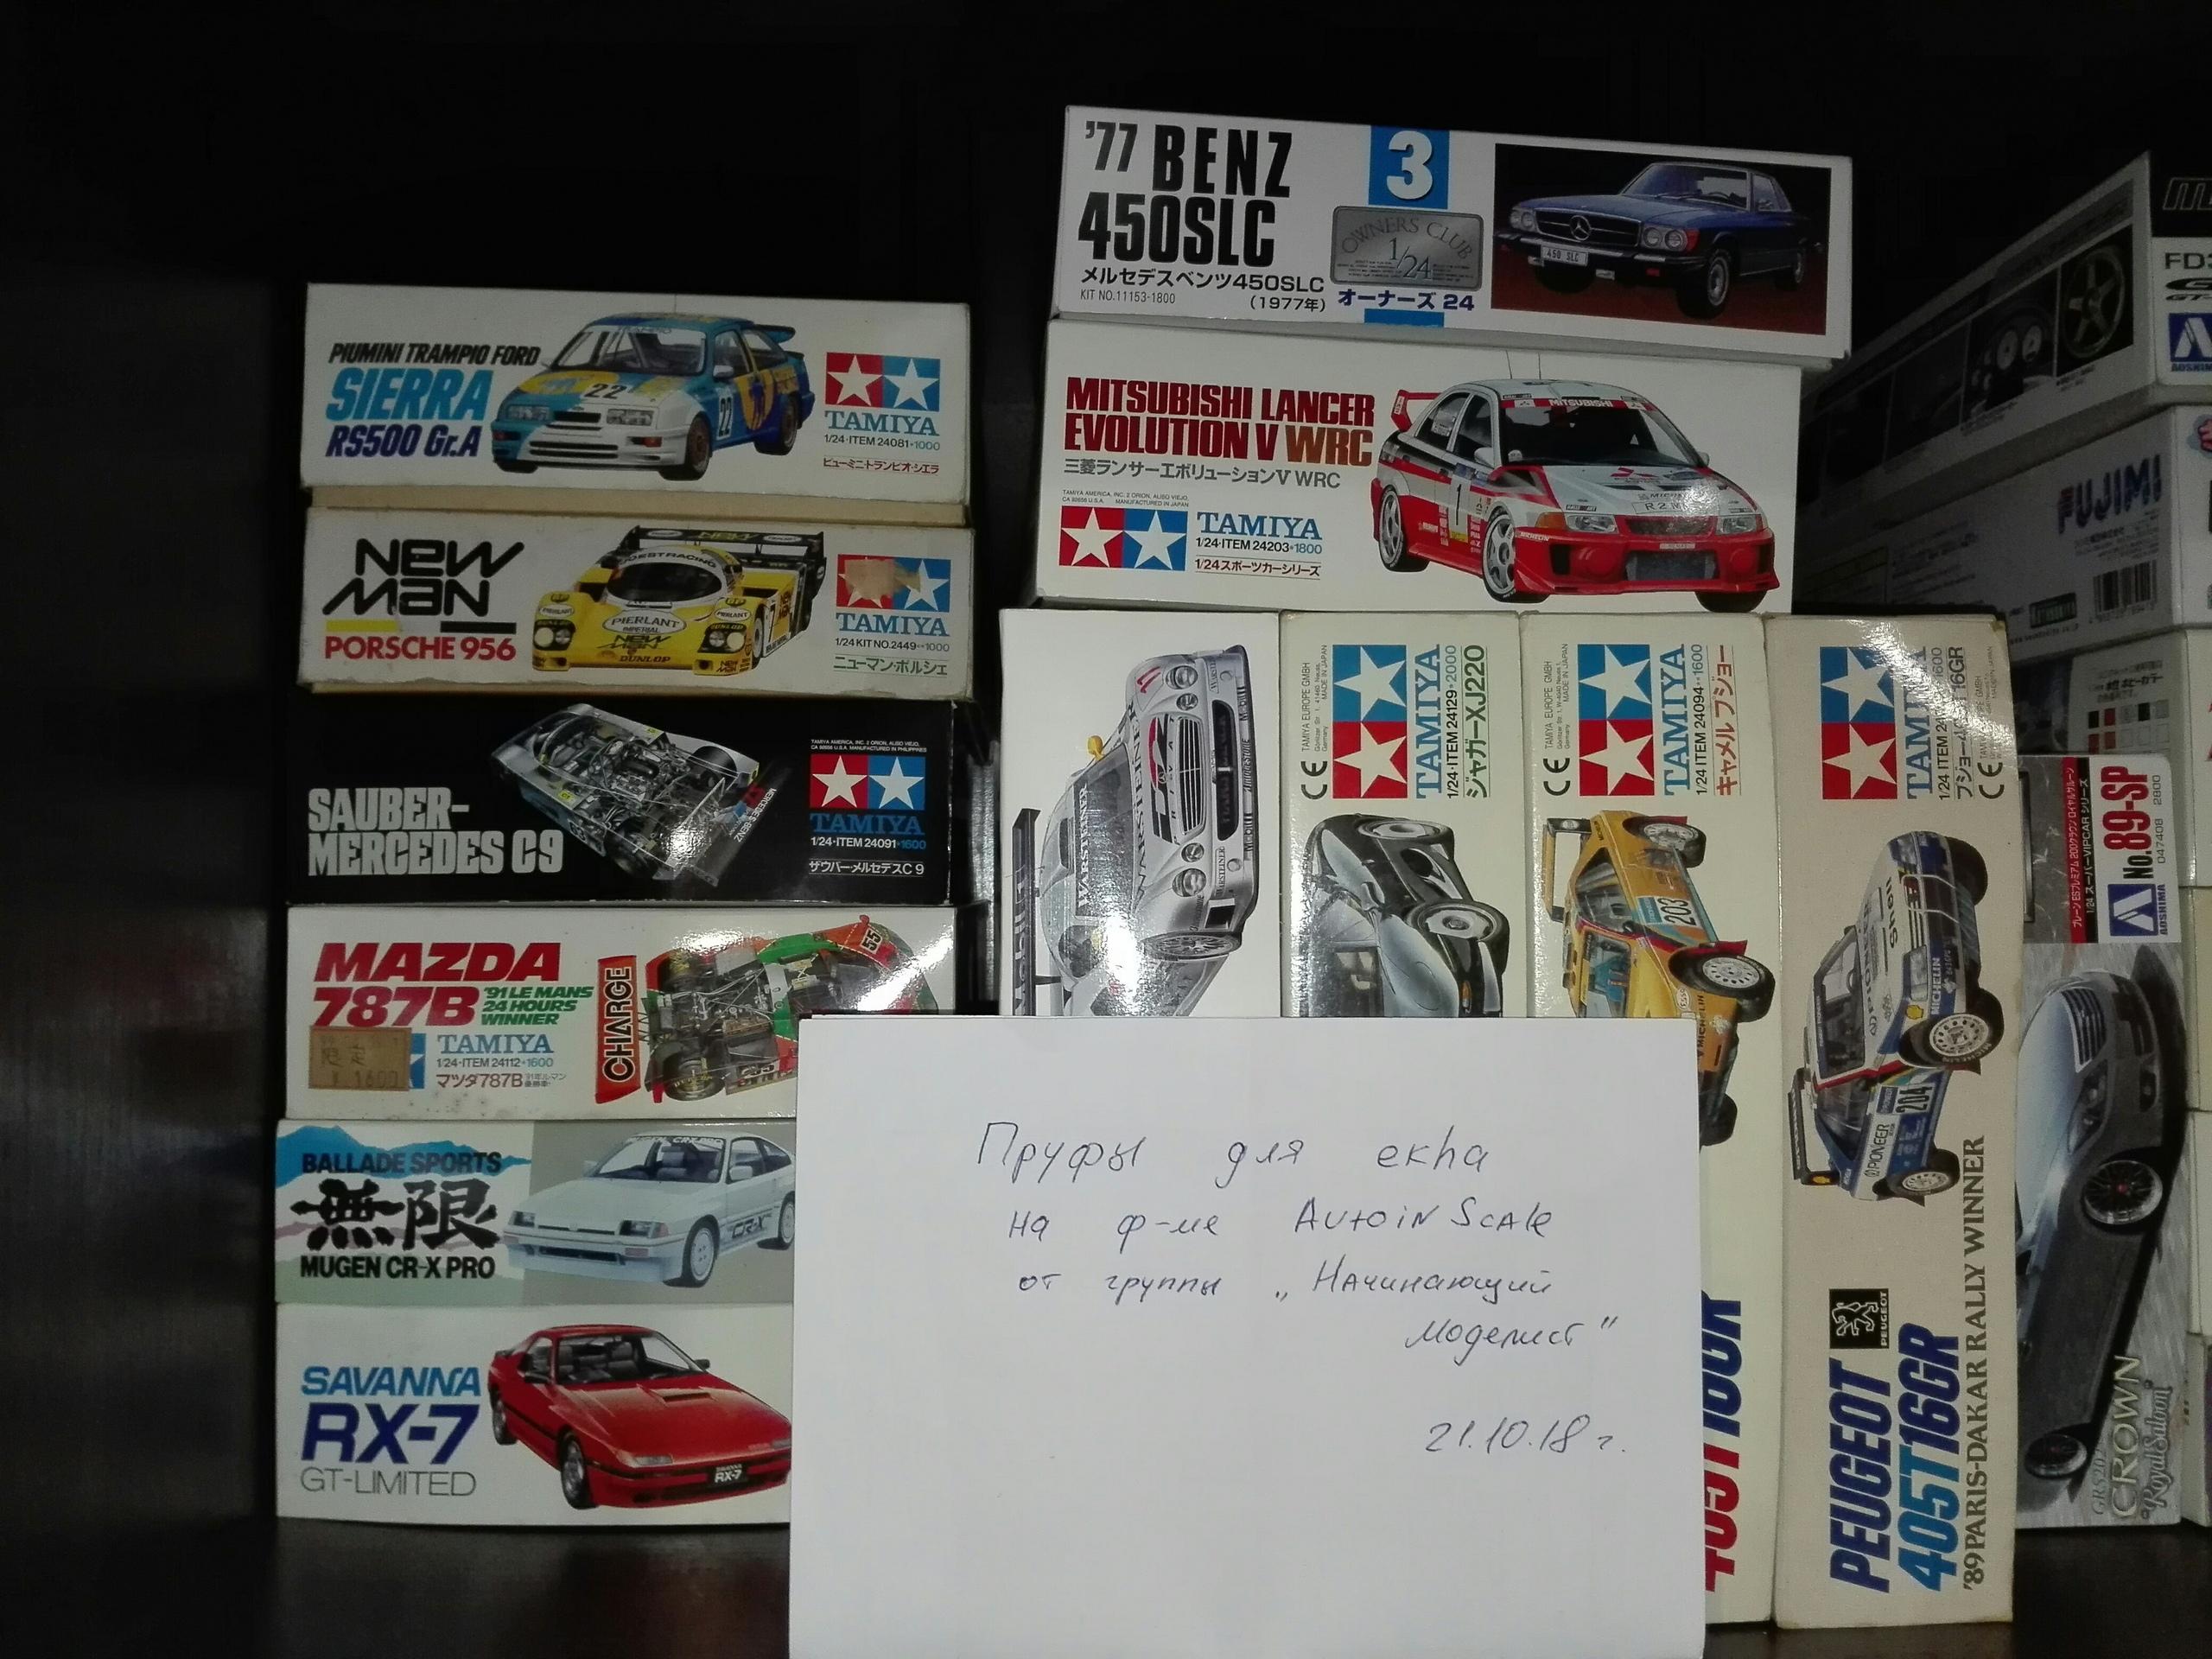 https://pp.userapi.com/c849432/v849432504/aa8a8/0r0AuiKXd1s.jpg